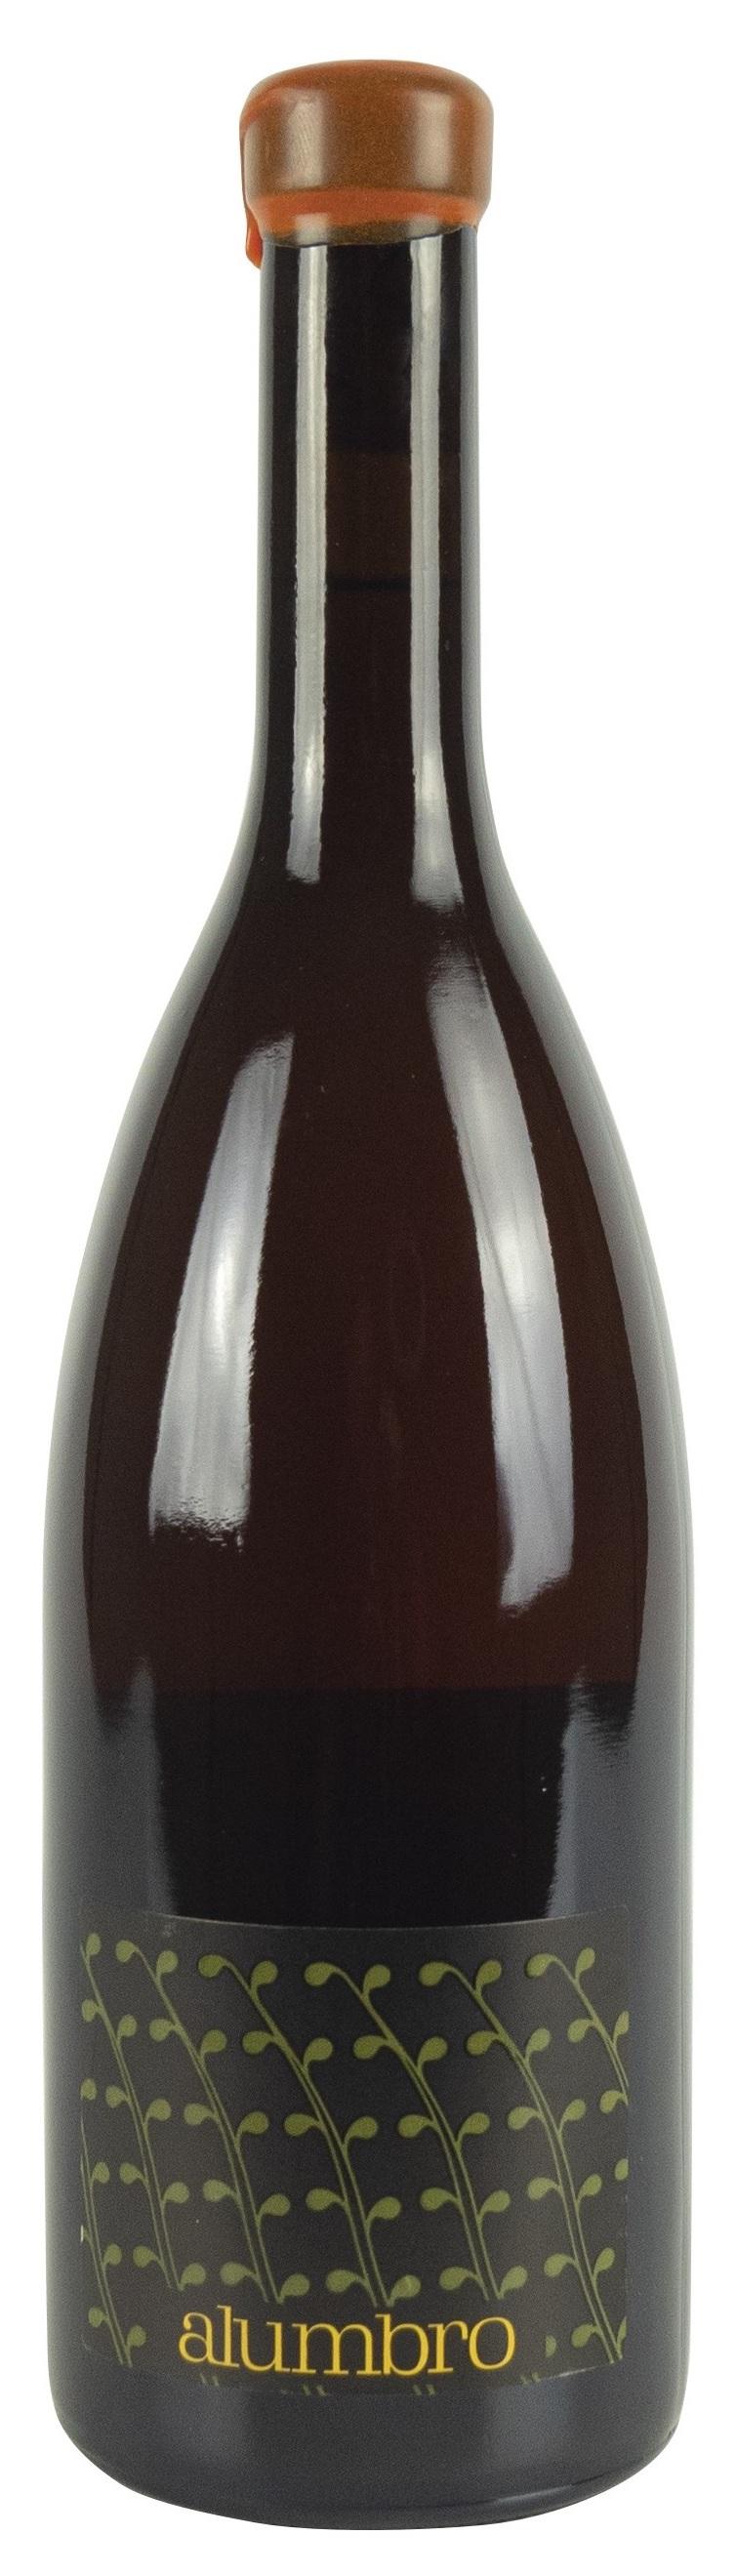 Berretes 18 | Microbodega de Alumbro - Winexfood